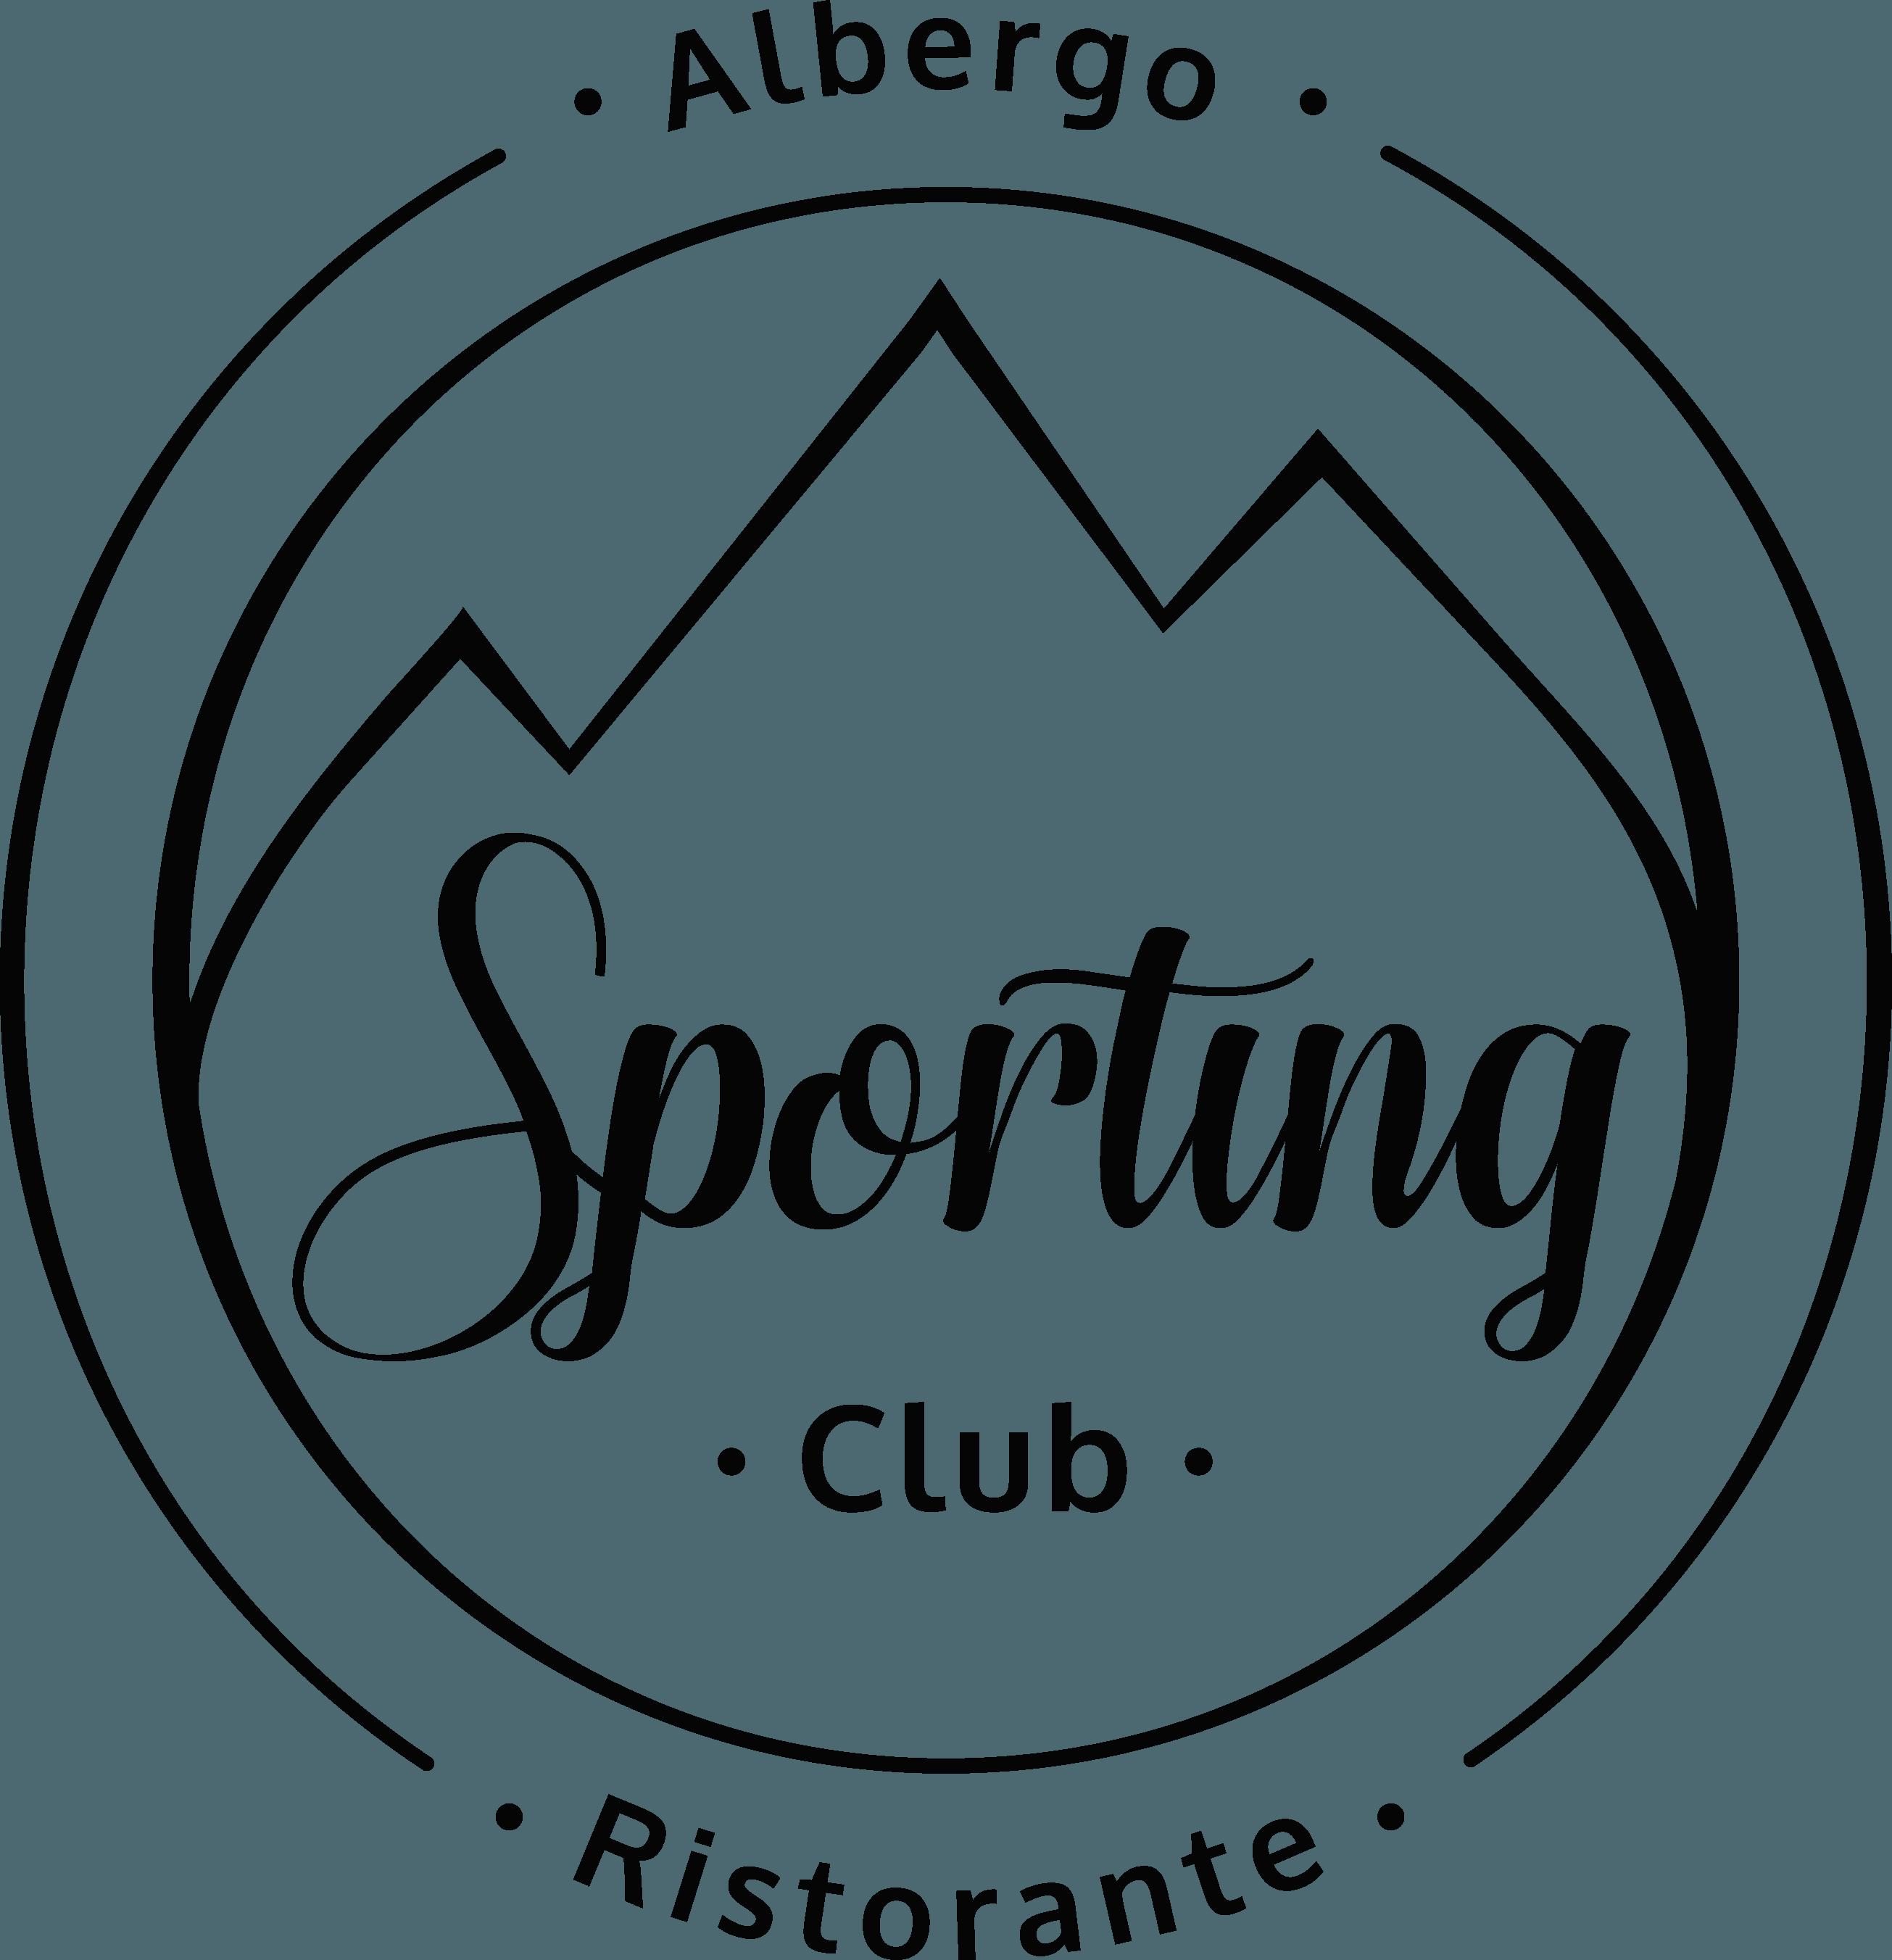 ALBERGO RISTORANTE SPORTING CLUB - LOGO